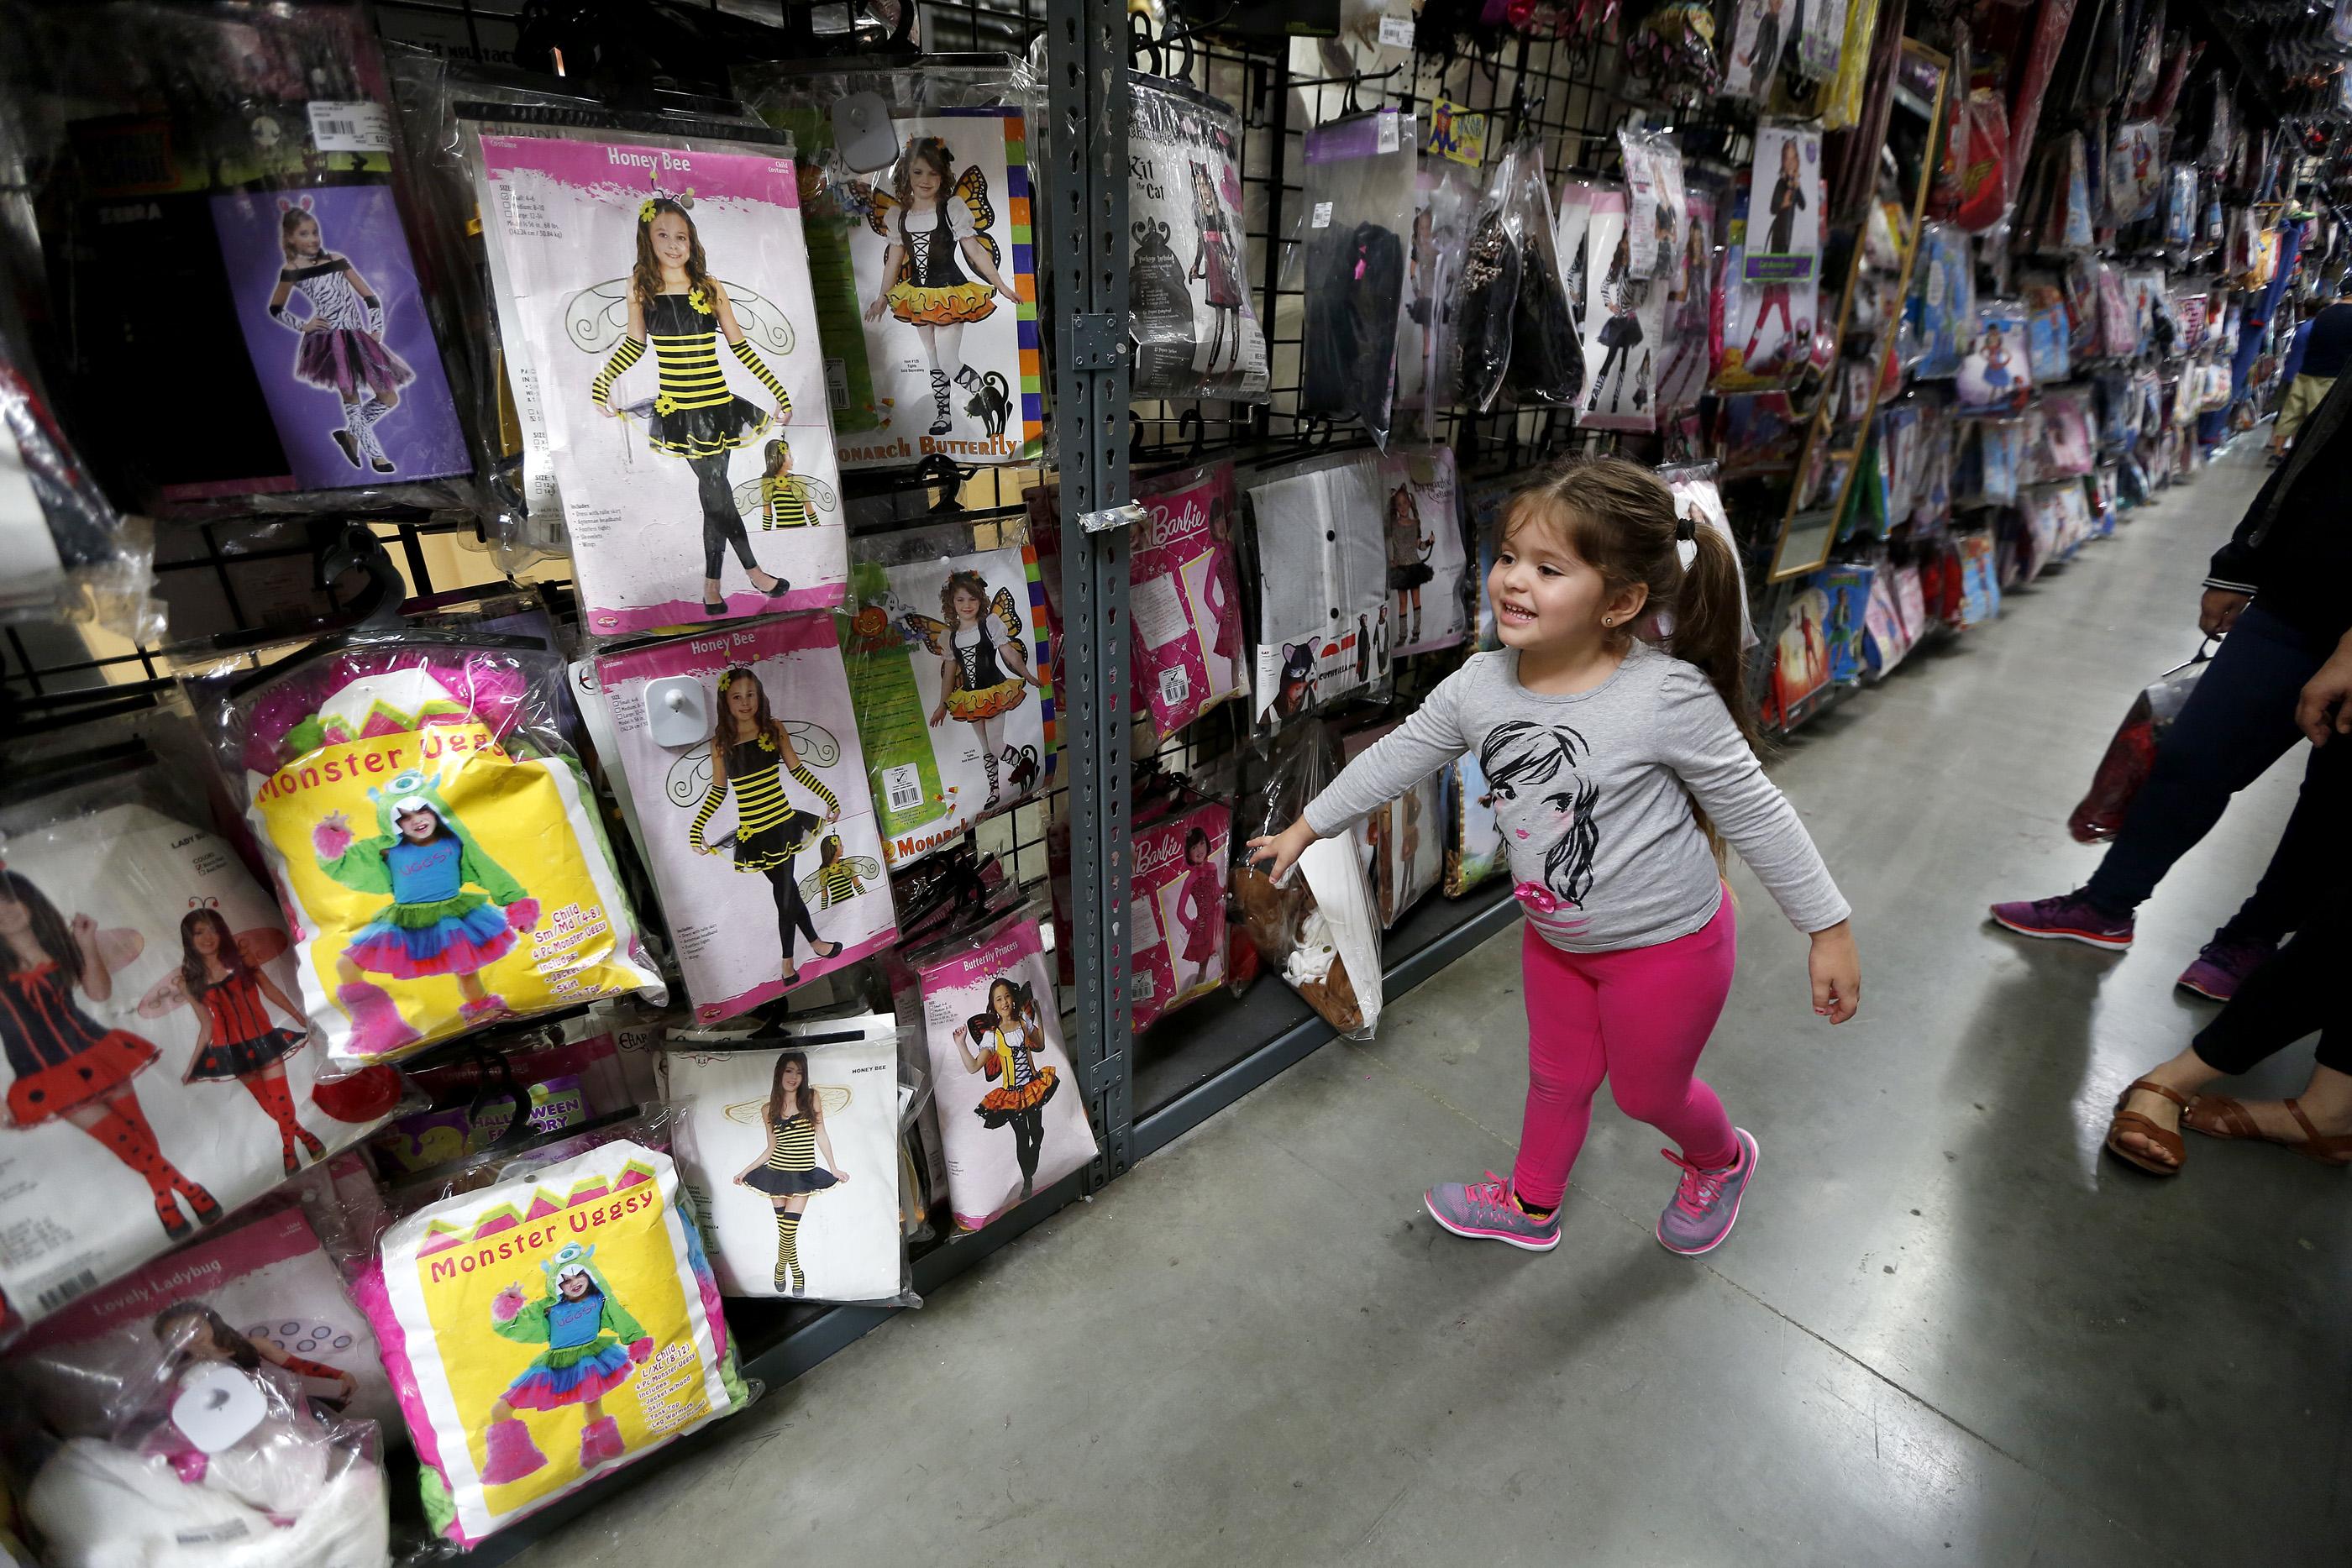 10/26/16 /LOS ANGELES/4 year old Victoria Montoya shops for a Halloween custom at the Halloween Club store in Montebello. (Photo by Aurelia Ventura/La Opinion)